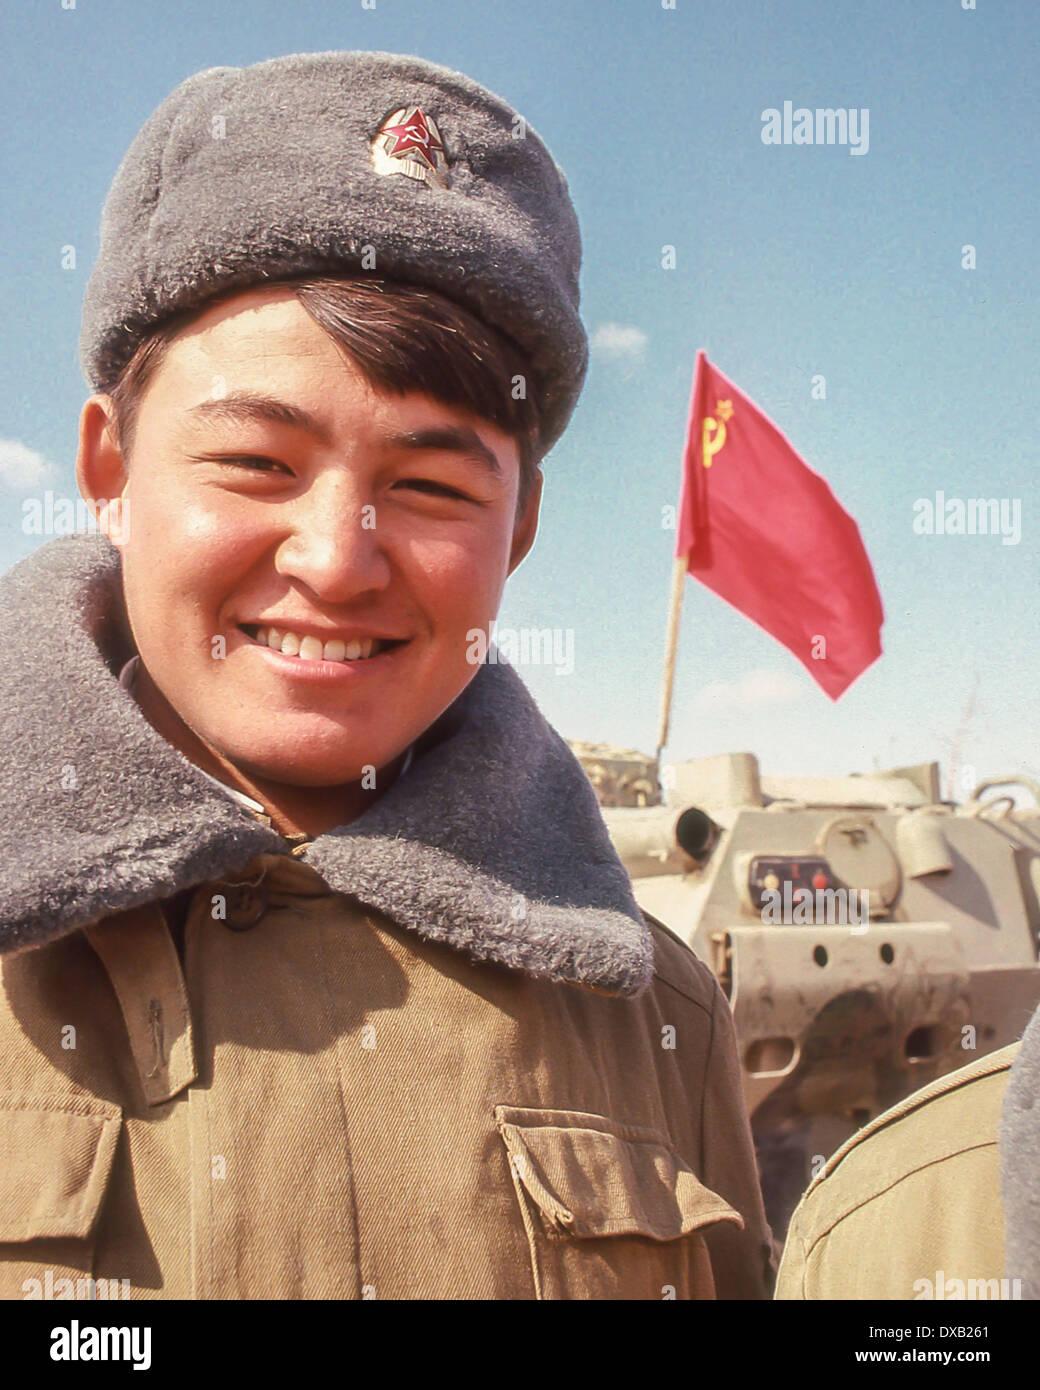 Soviet Afghanistan war - Page 6 Feb-16-1989-termez-uzbekistan-ru-a-smiling-soviet-soldier-of-the-103rd-DXB261